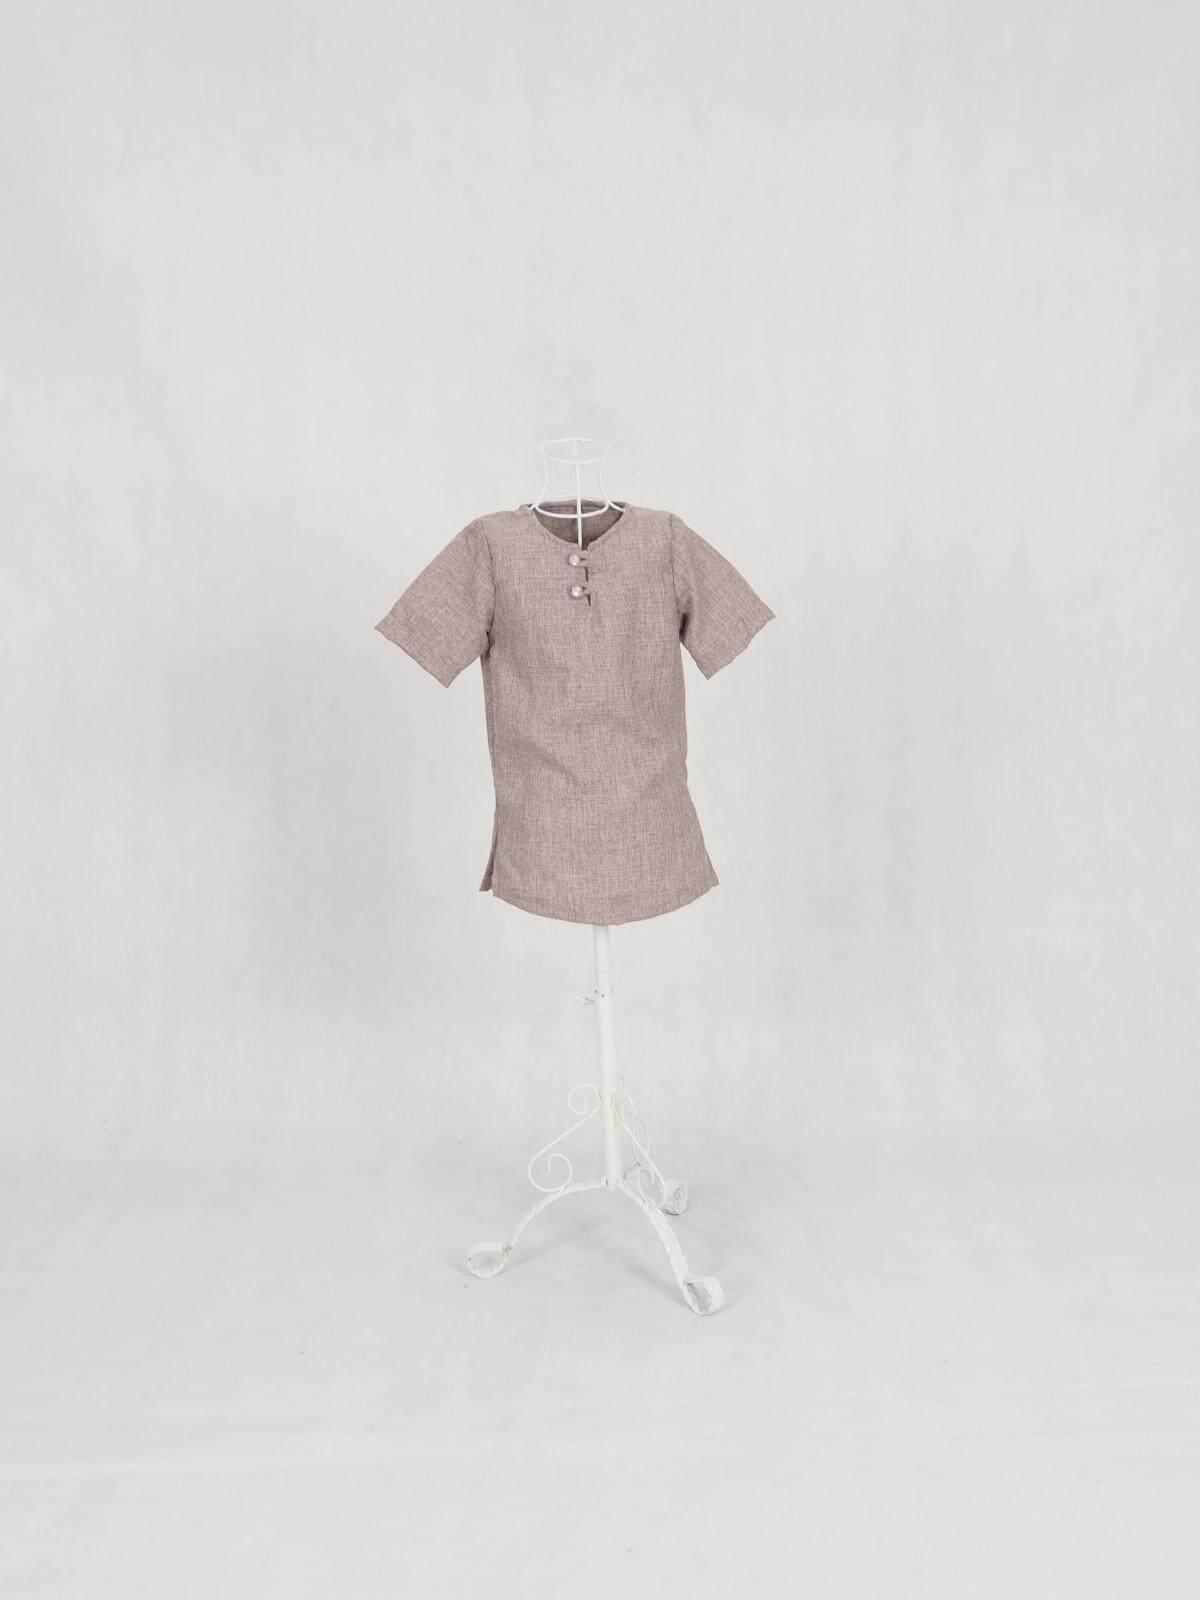 Muslim Boy Kanak-Kanak Moden Cotten Kurta / Hafiz Short sleeve Man Top Kid (3Months-6Years) / Raya Kurta 2020 / Ready Stock / Murah / Ship from Malaysia / Hot Product